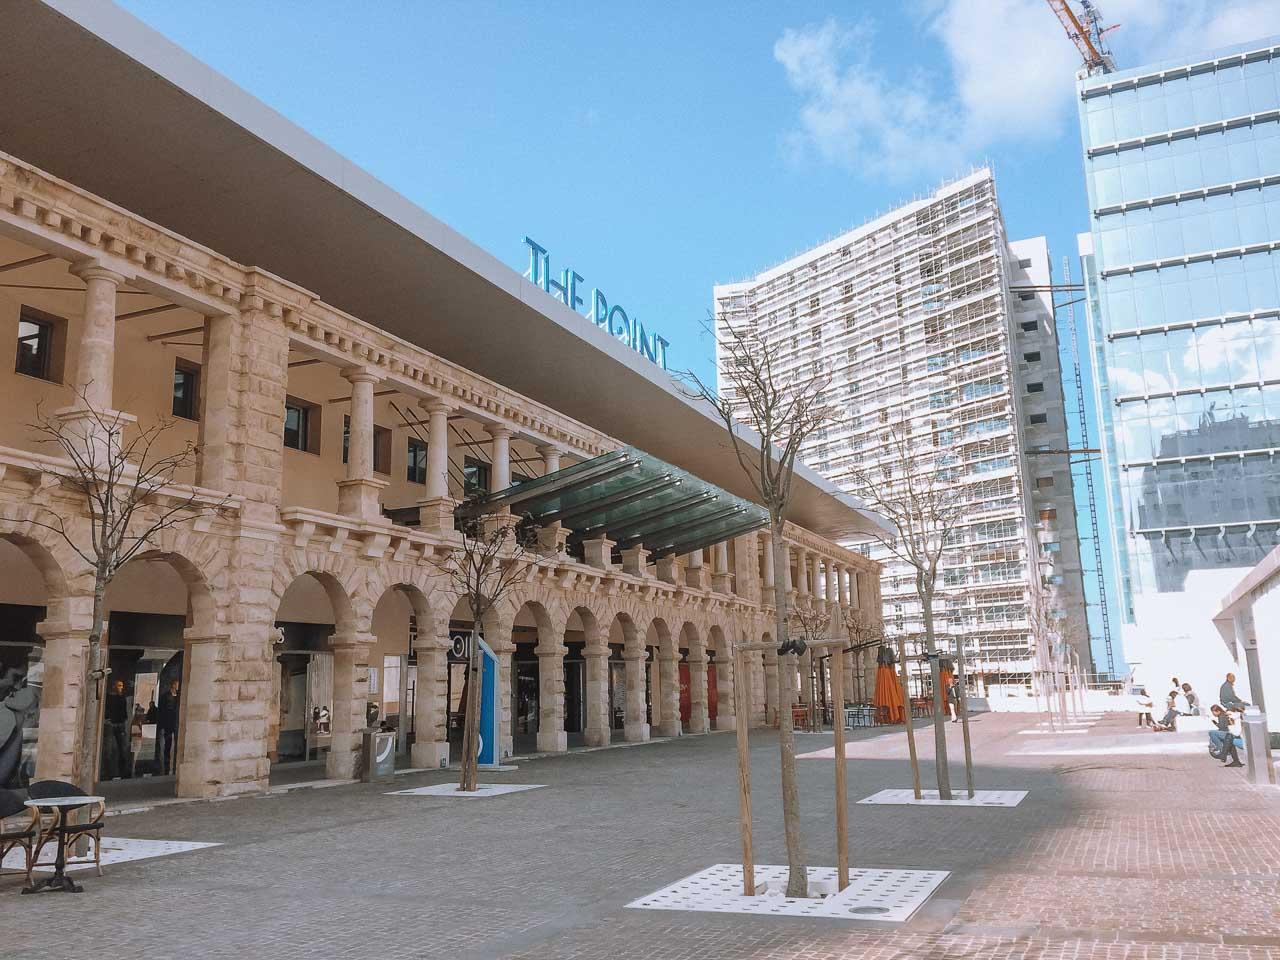 The Point mall in Sliema, Malta